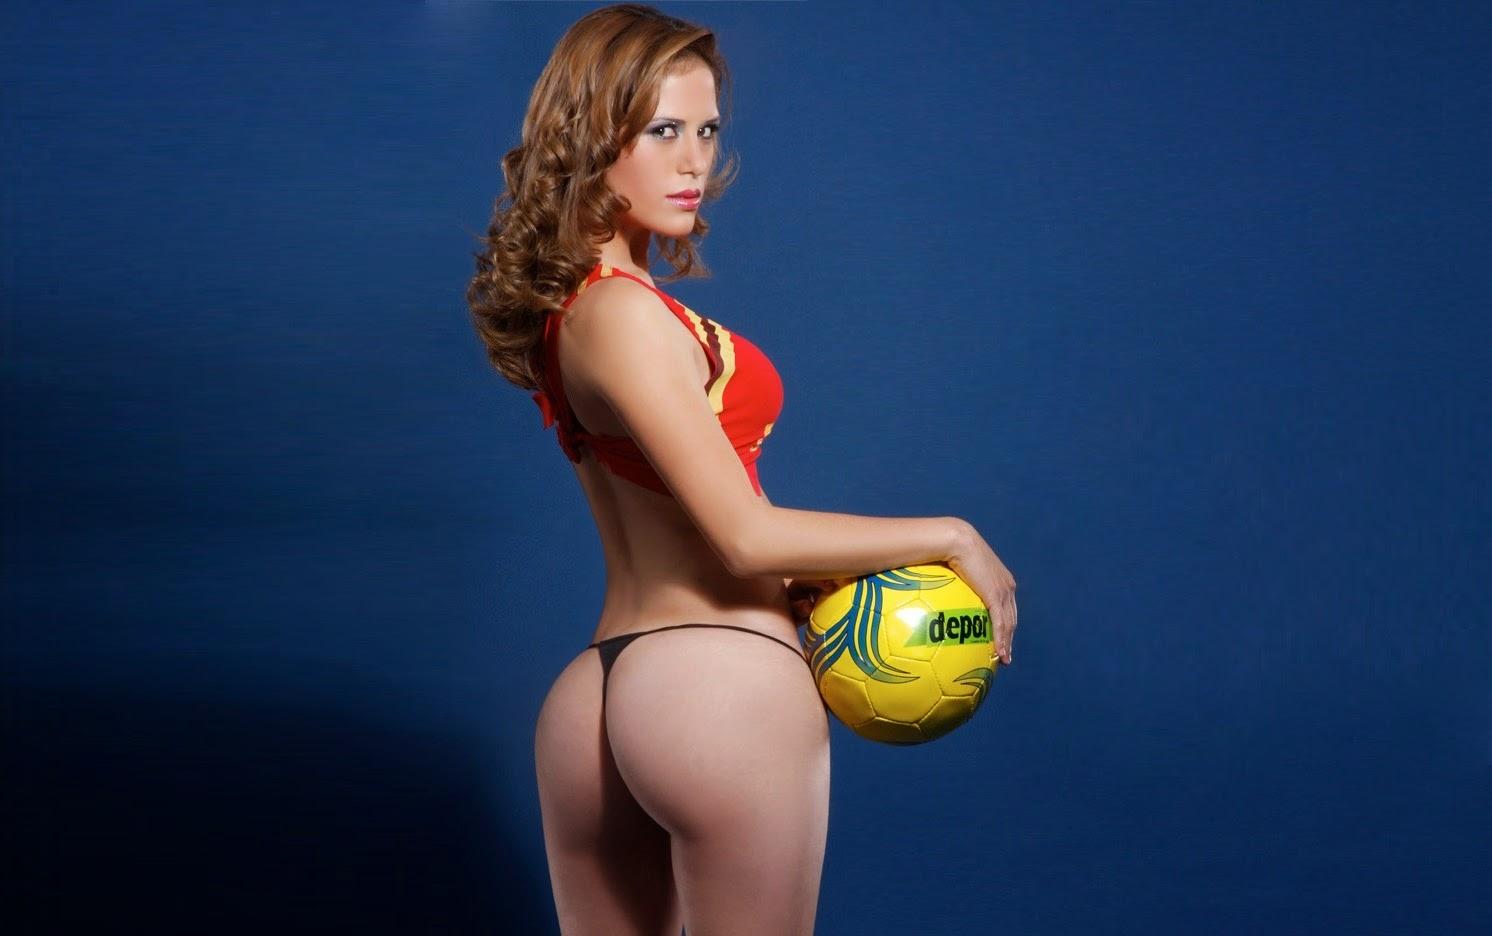 lindas mulheres e super carros sele espanhola   marianella coral